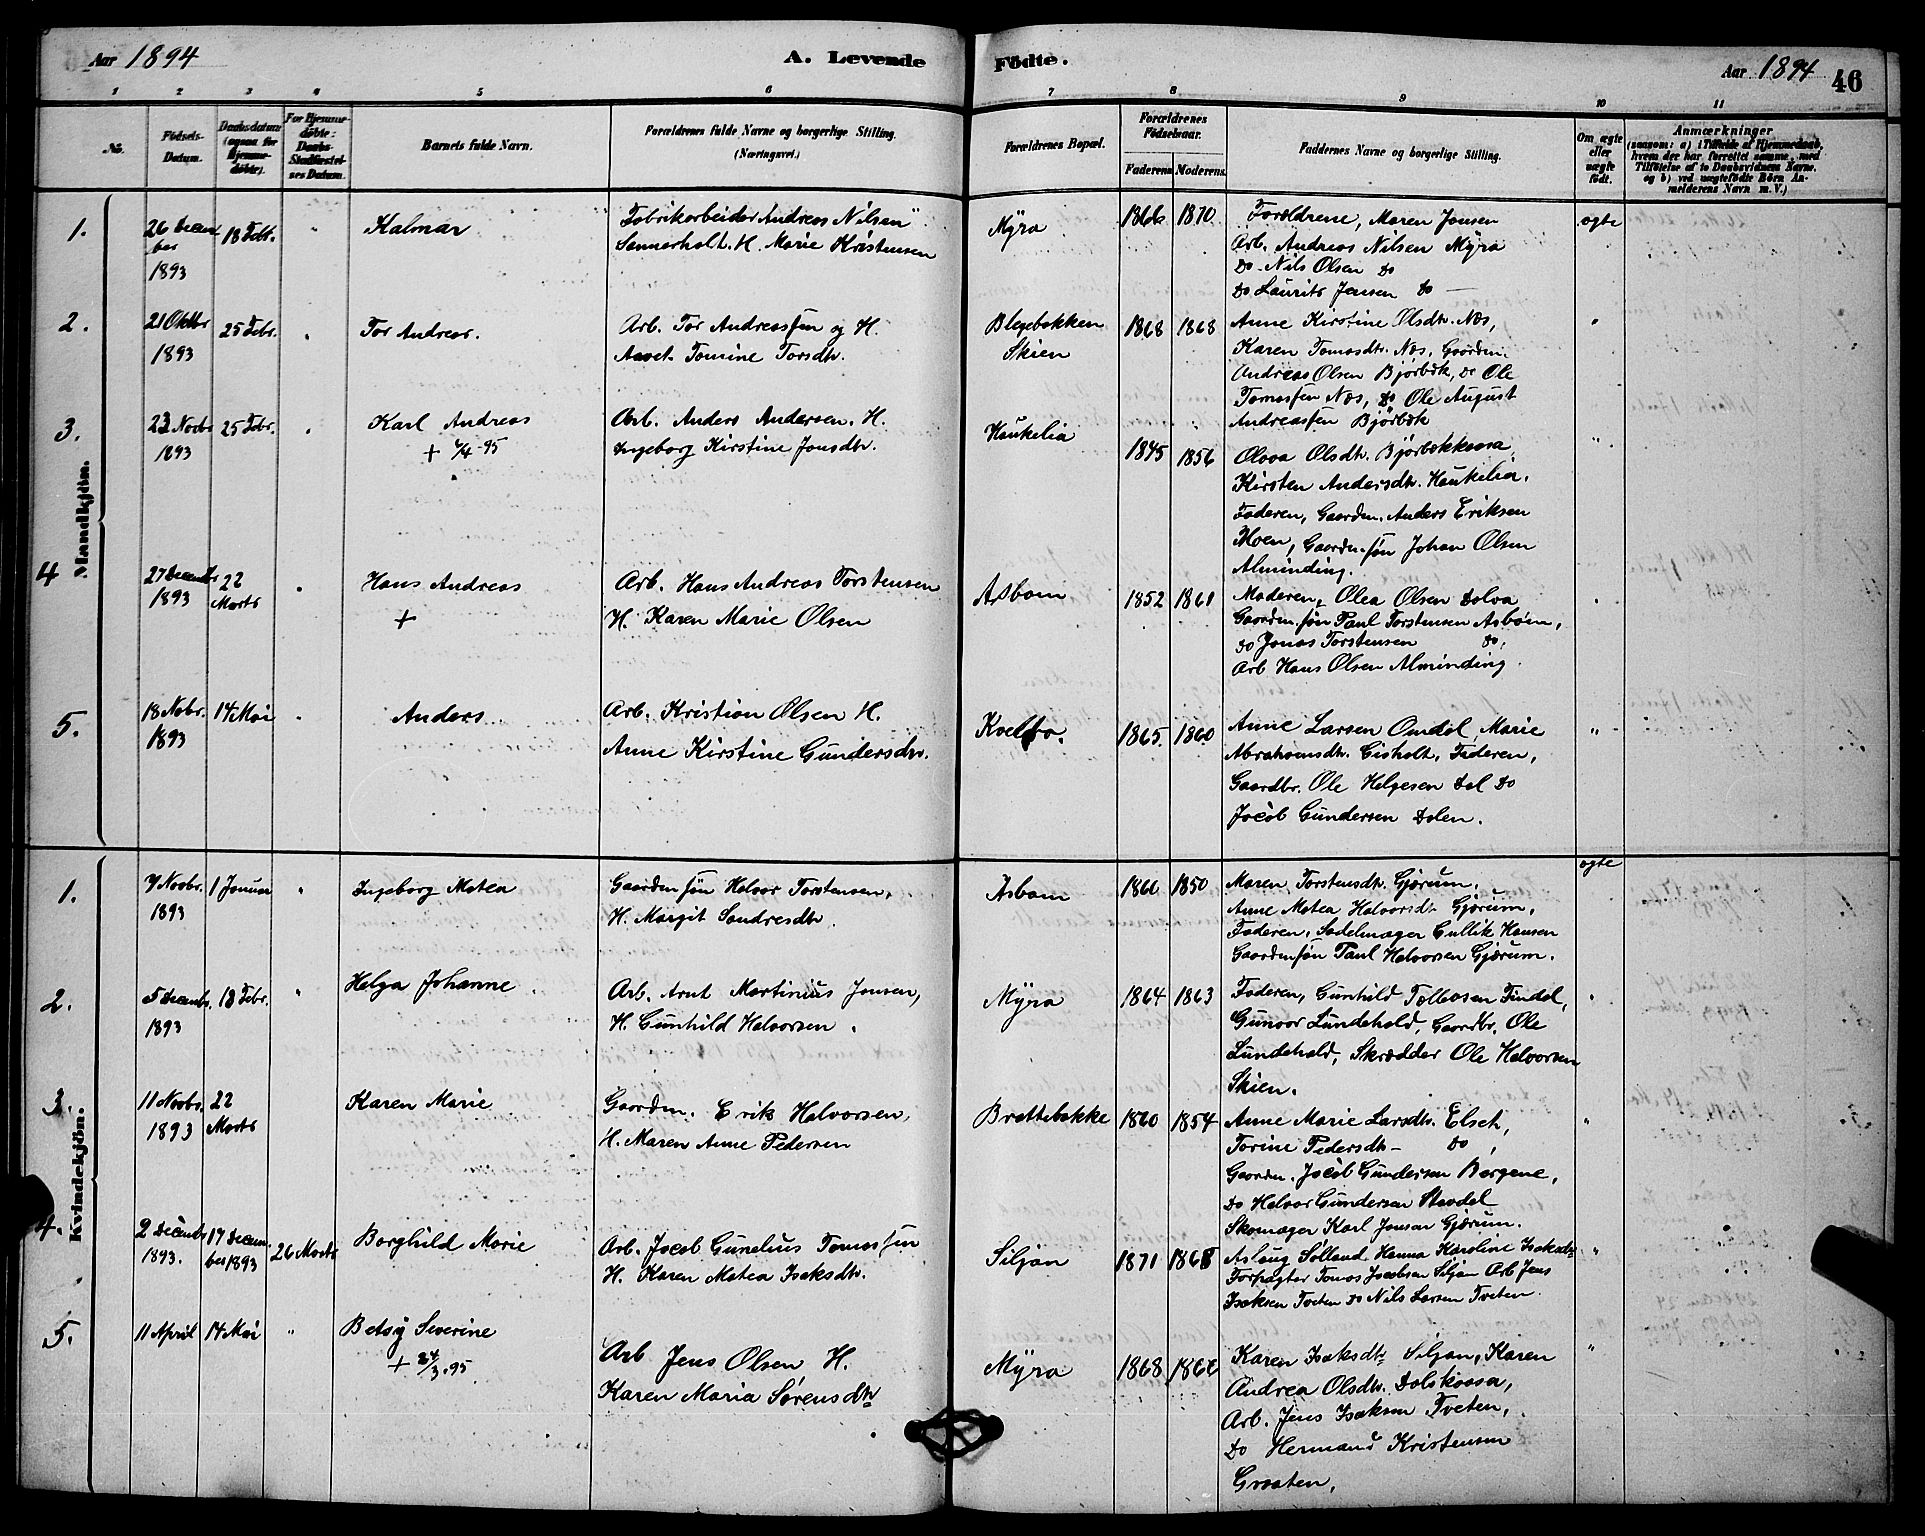 SAKO, Solum kirkebøker, G/Gb/L0003: Klokkerbok nr. II 3, 1880-1898, s. 46